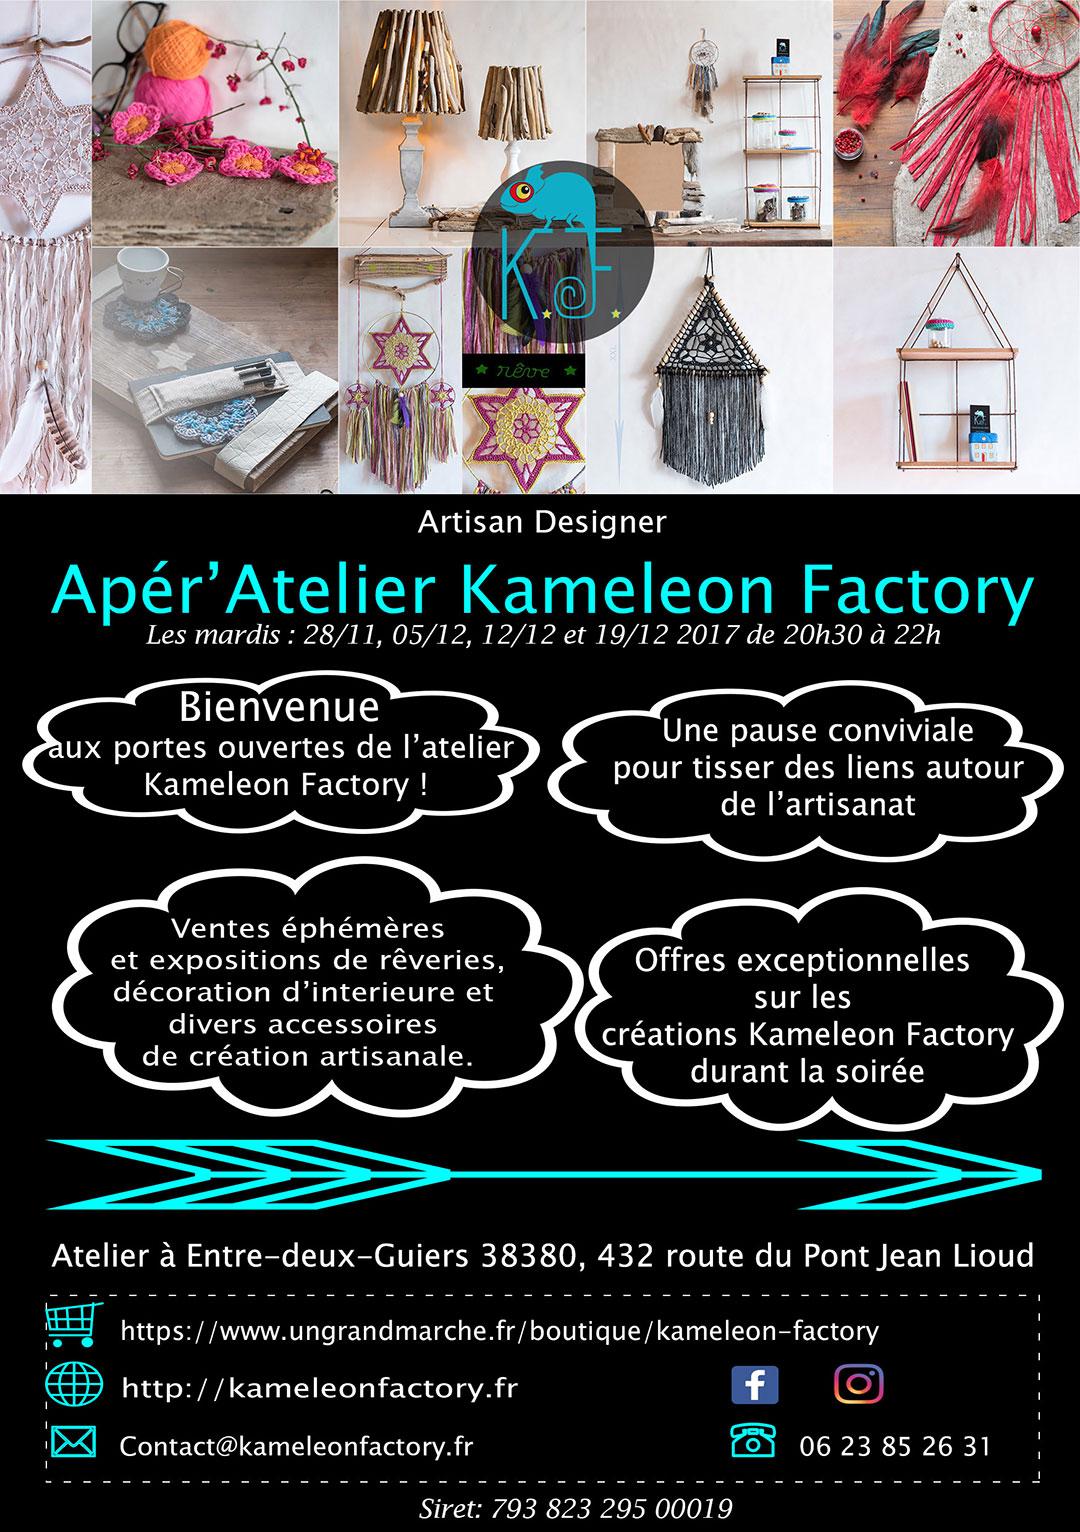 Flyer Apér'atelier Kameleon Factory